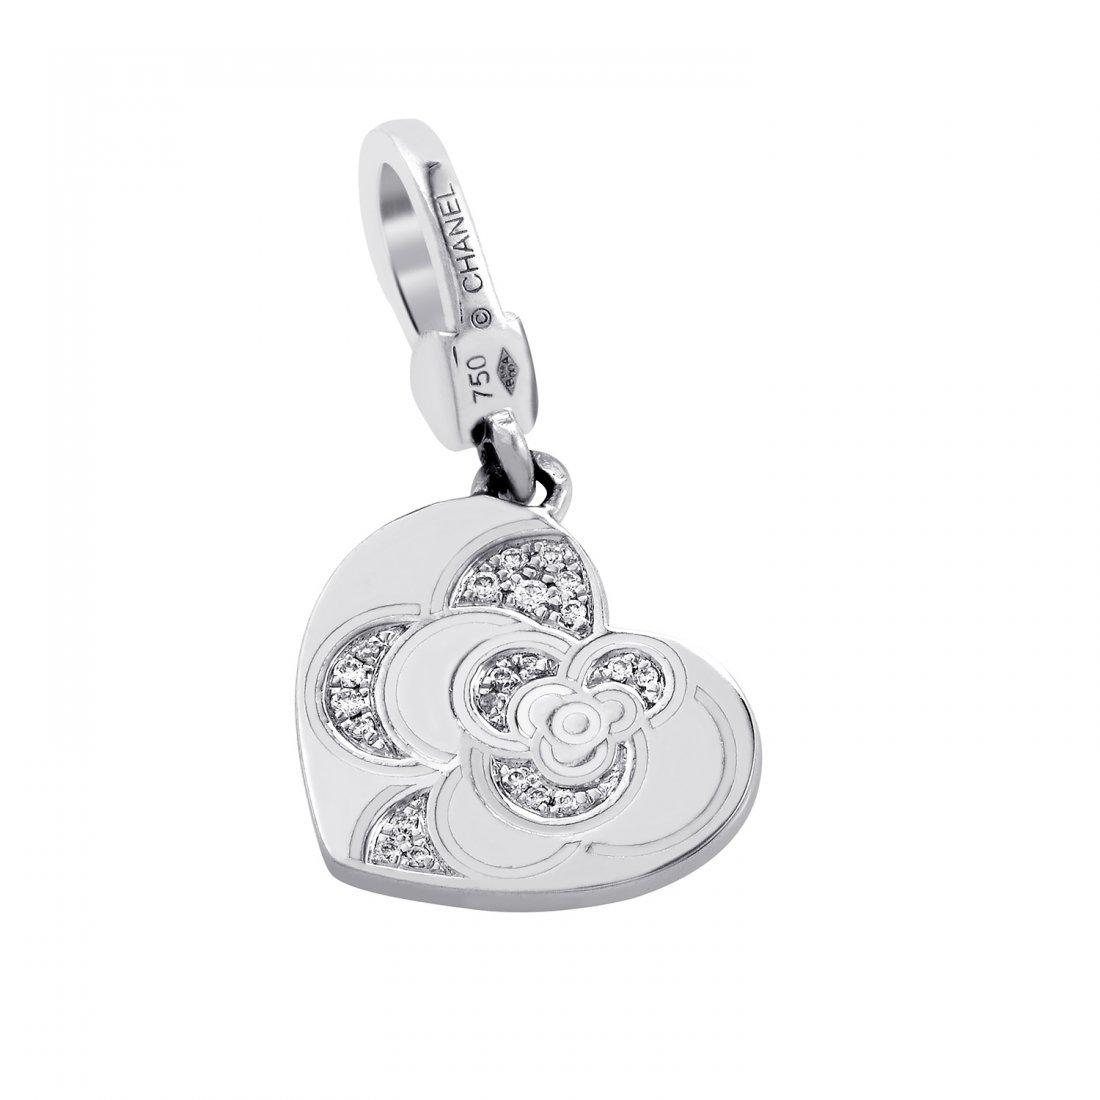 Chanel: Chanel Camélia Heart 18K White Gold Diamond